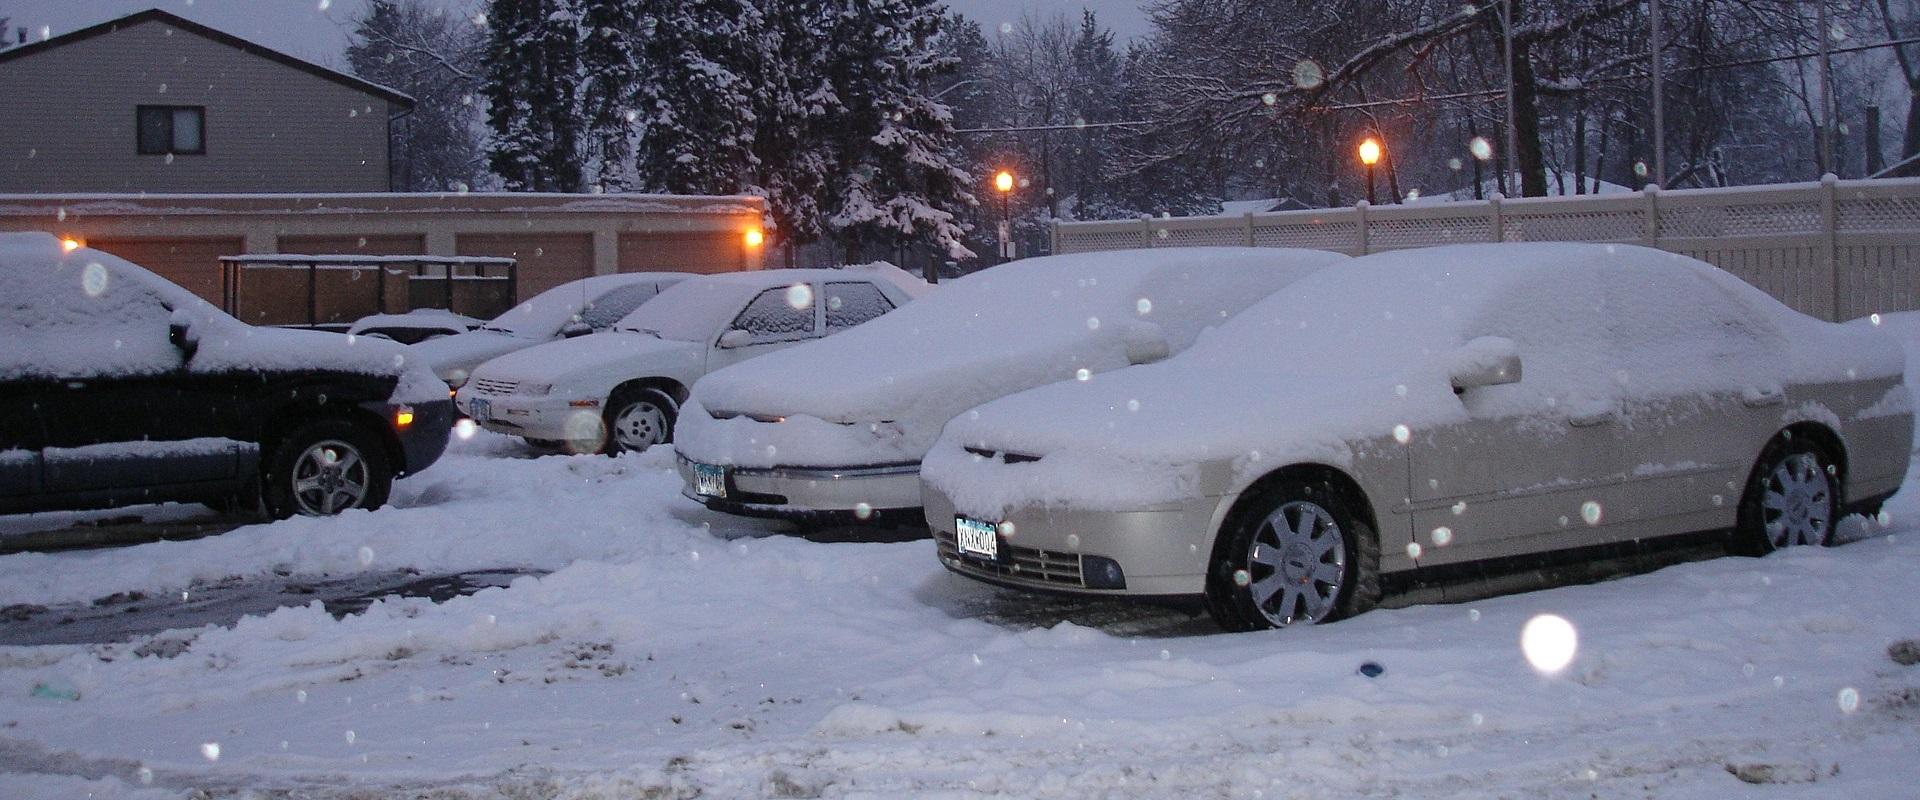 winter-430469_1920